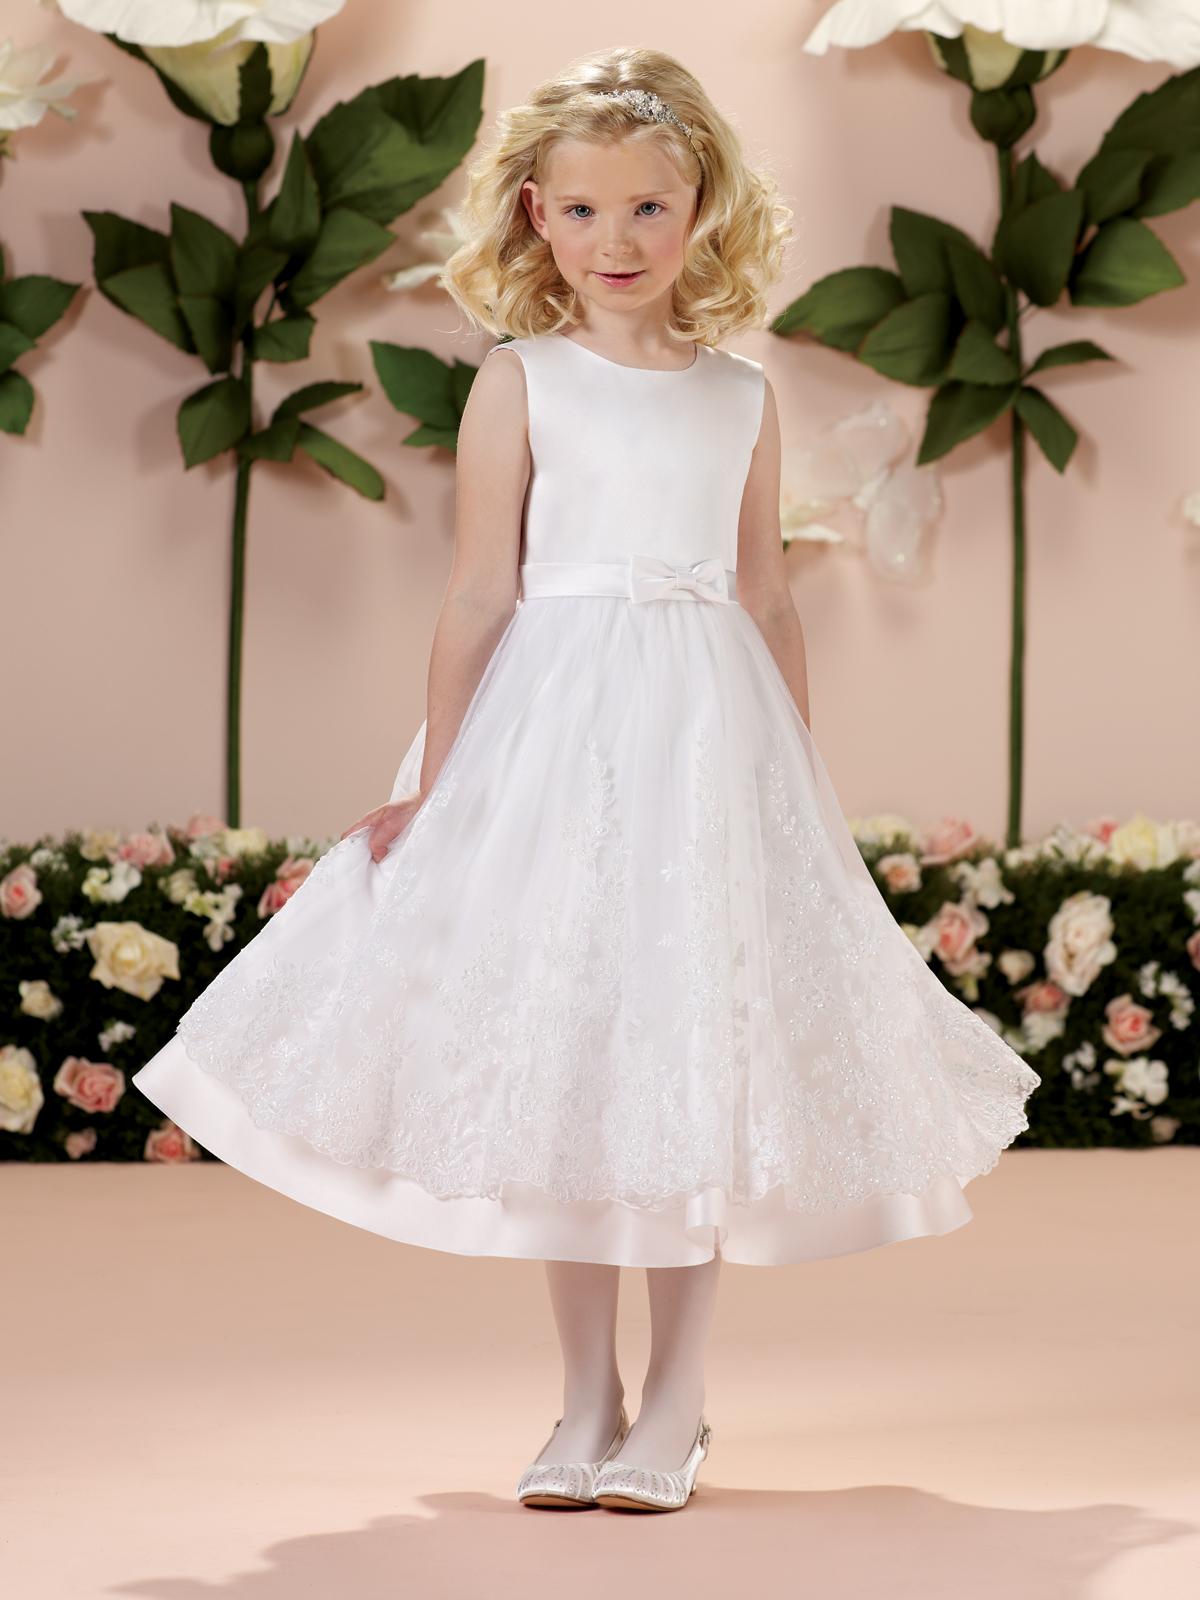 114341_white_Communion_Dress_2014